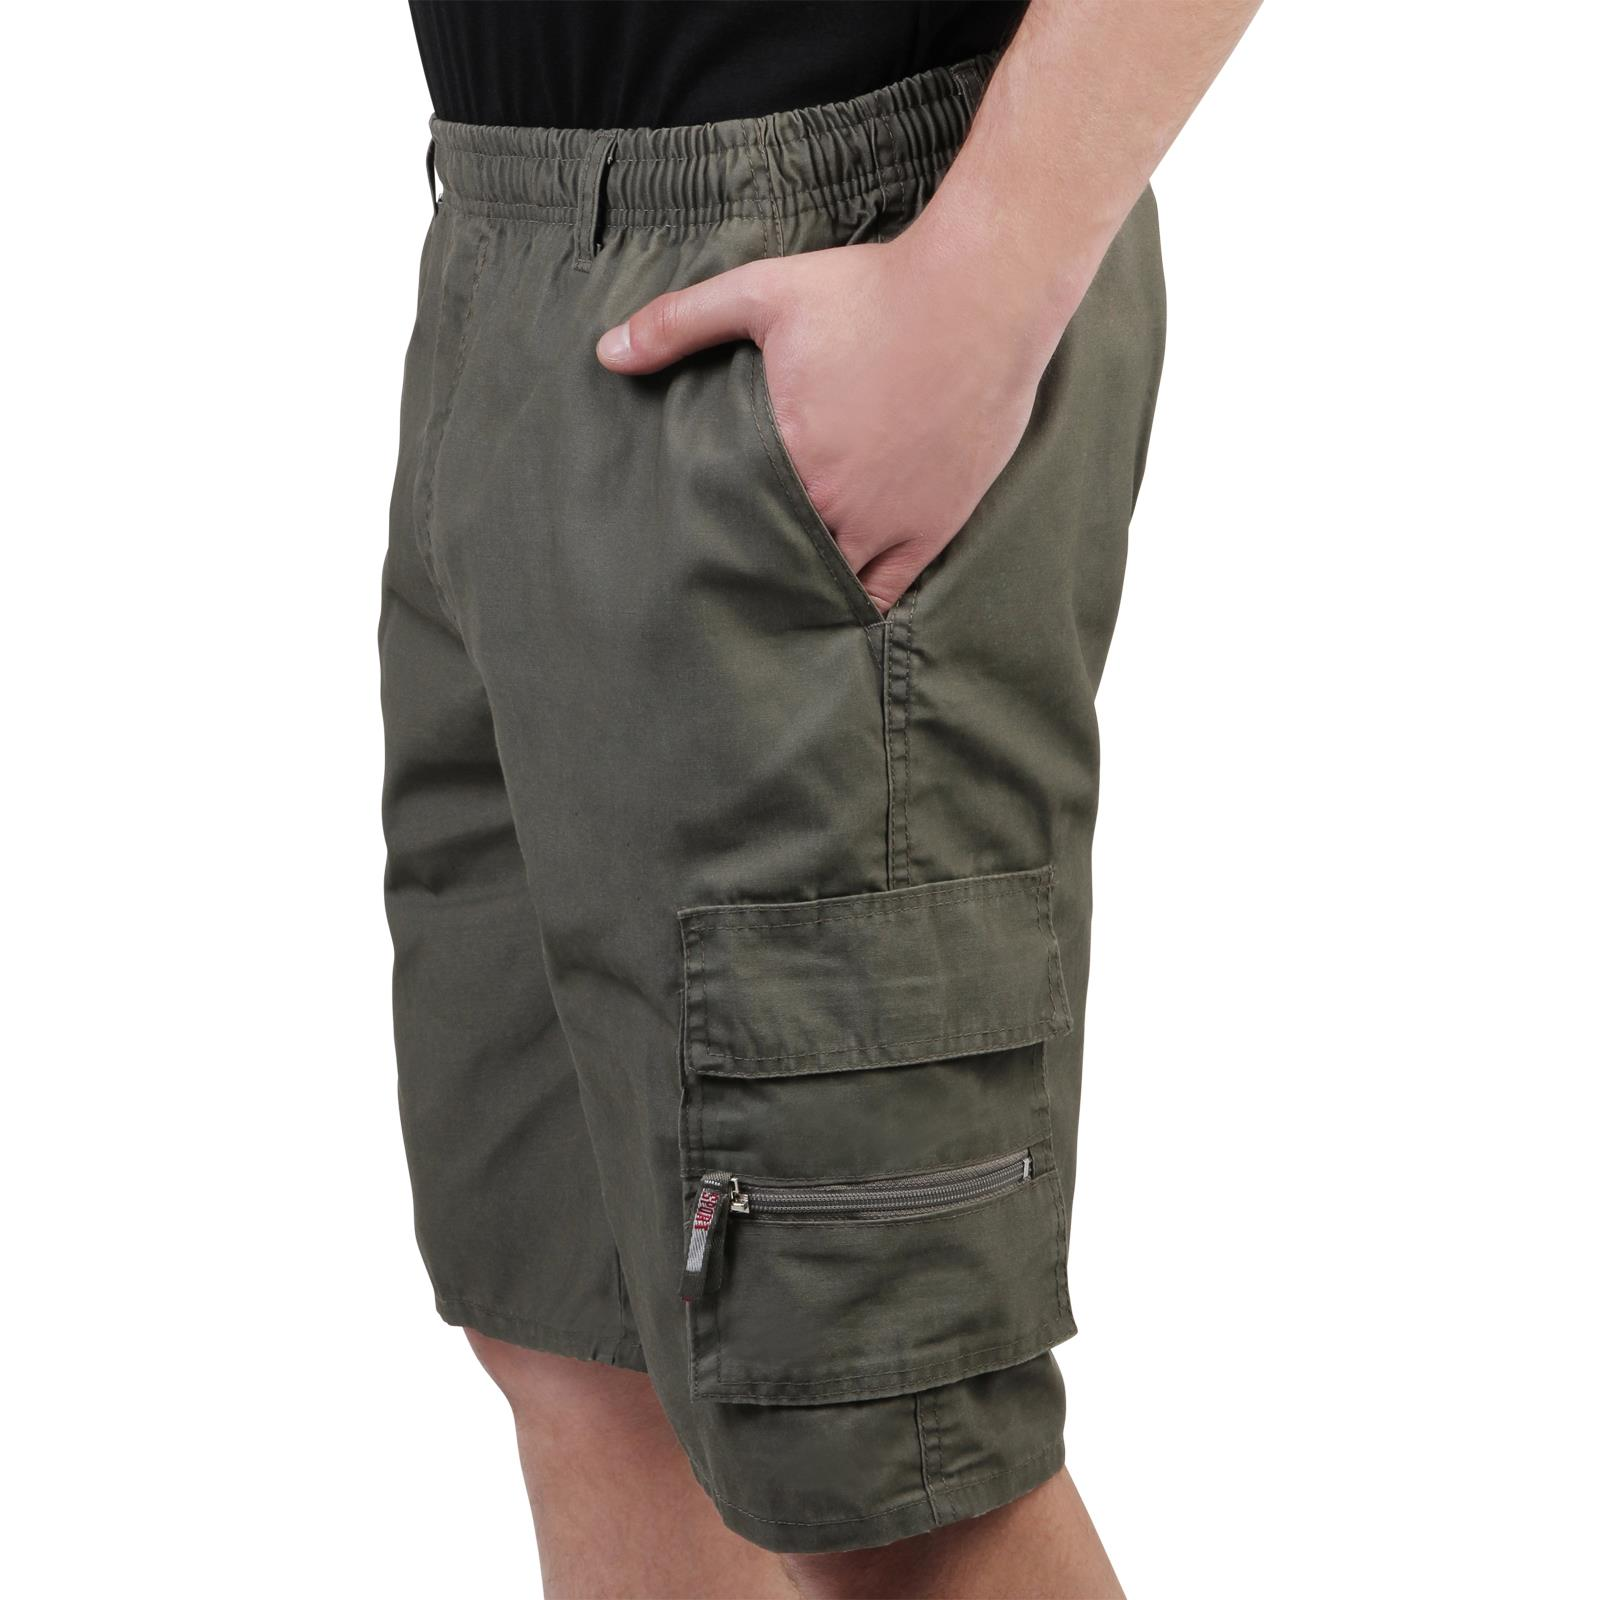 Mens-Cotton-Cargo-Shorts-Plain-Basic-Casual-Work-Chinos-Combat-Pants-Regular thumbnail 5